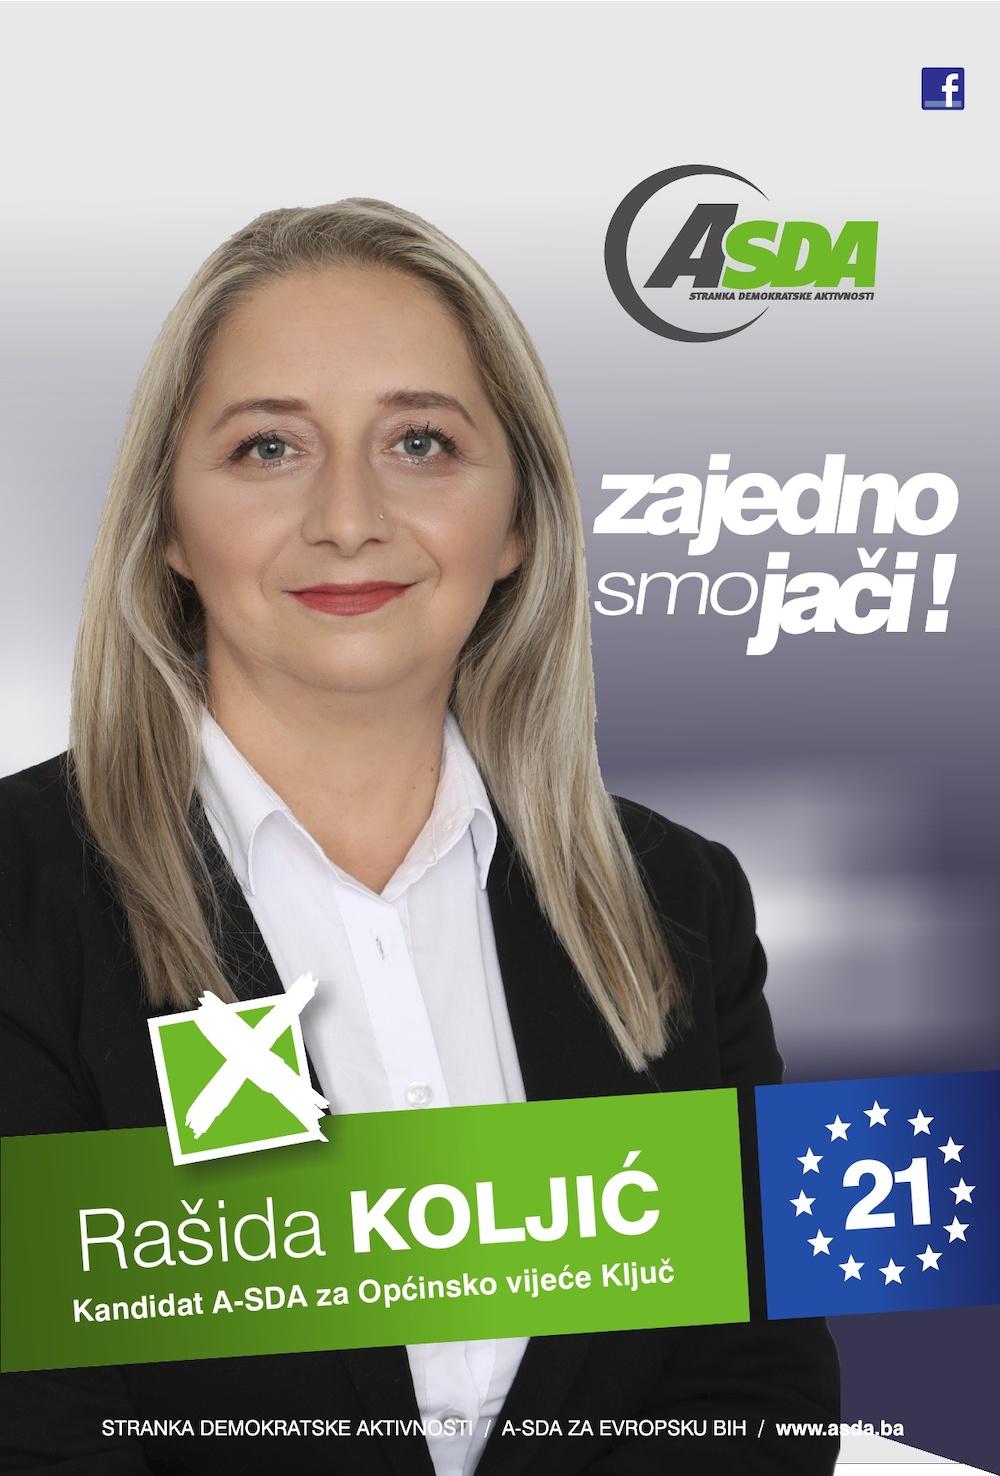 Rašida Koljić